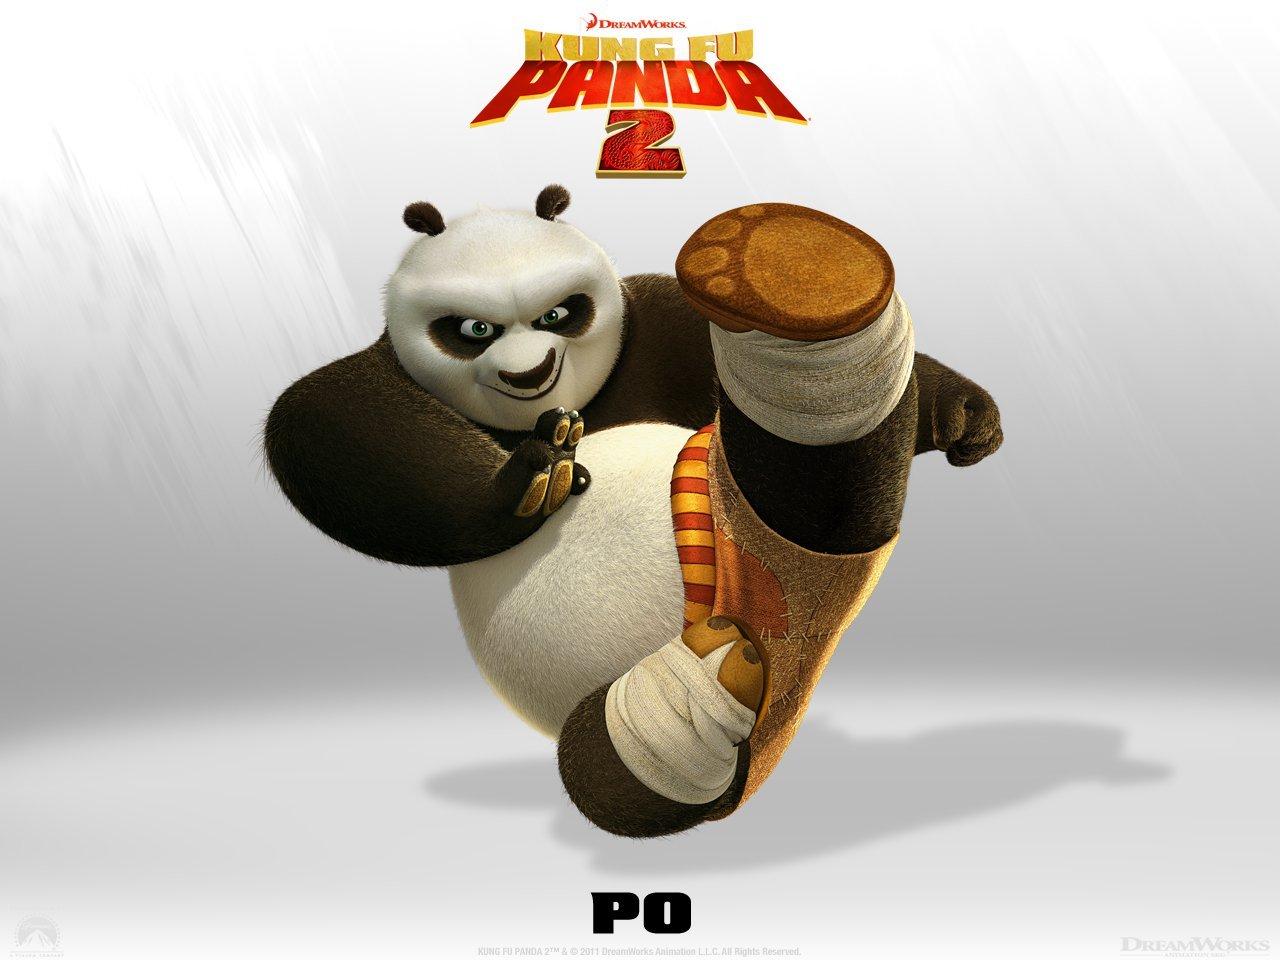 http://1.bp.blogspot.com/-atid5-ccICA/TYgZ7IG2cBI/AAAAAAAAAFE/bL_SF0kOtJU/s1600/Kung-Fu-Panda-2-Wallpaper-Po.jpg